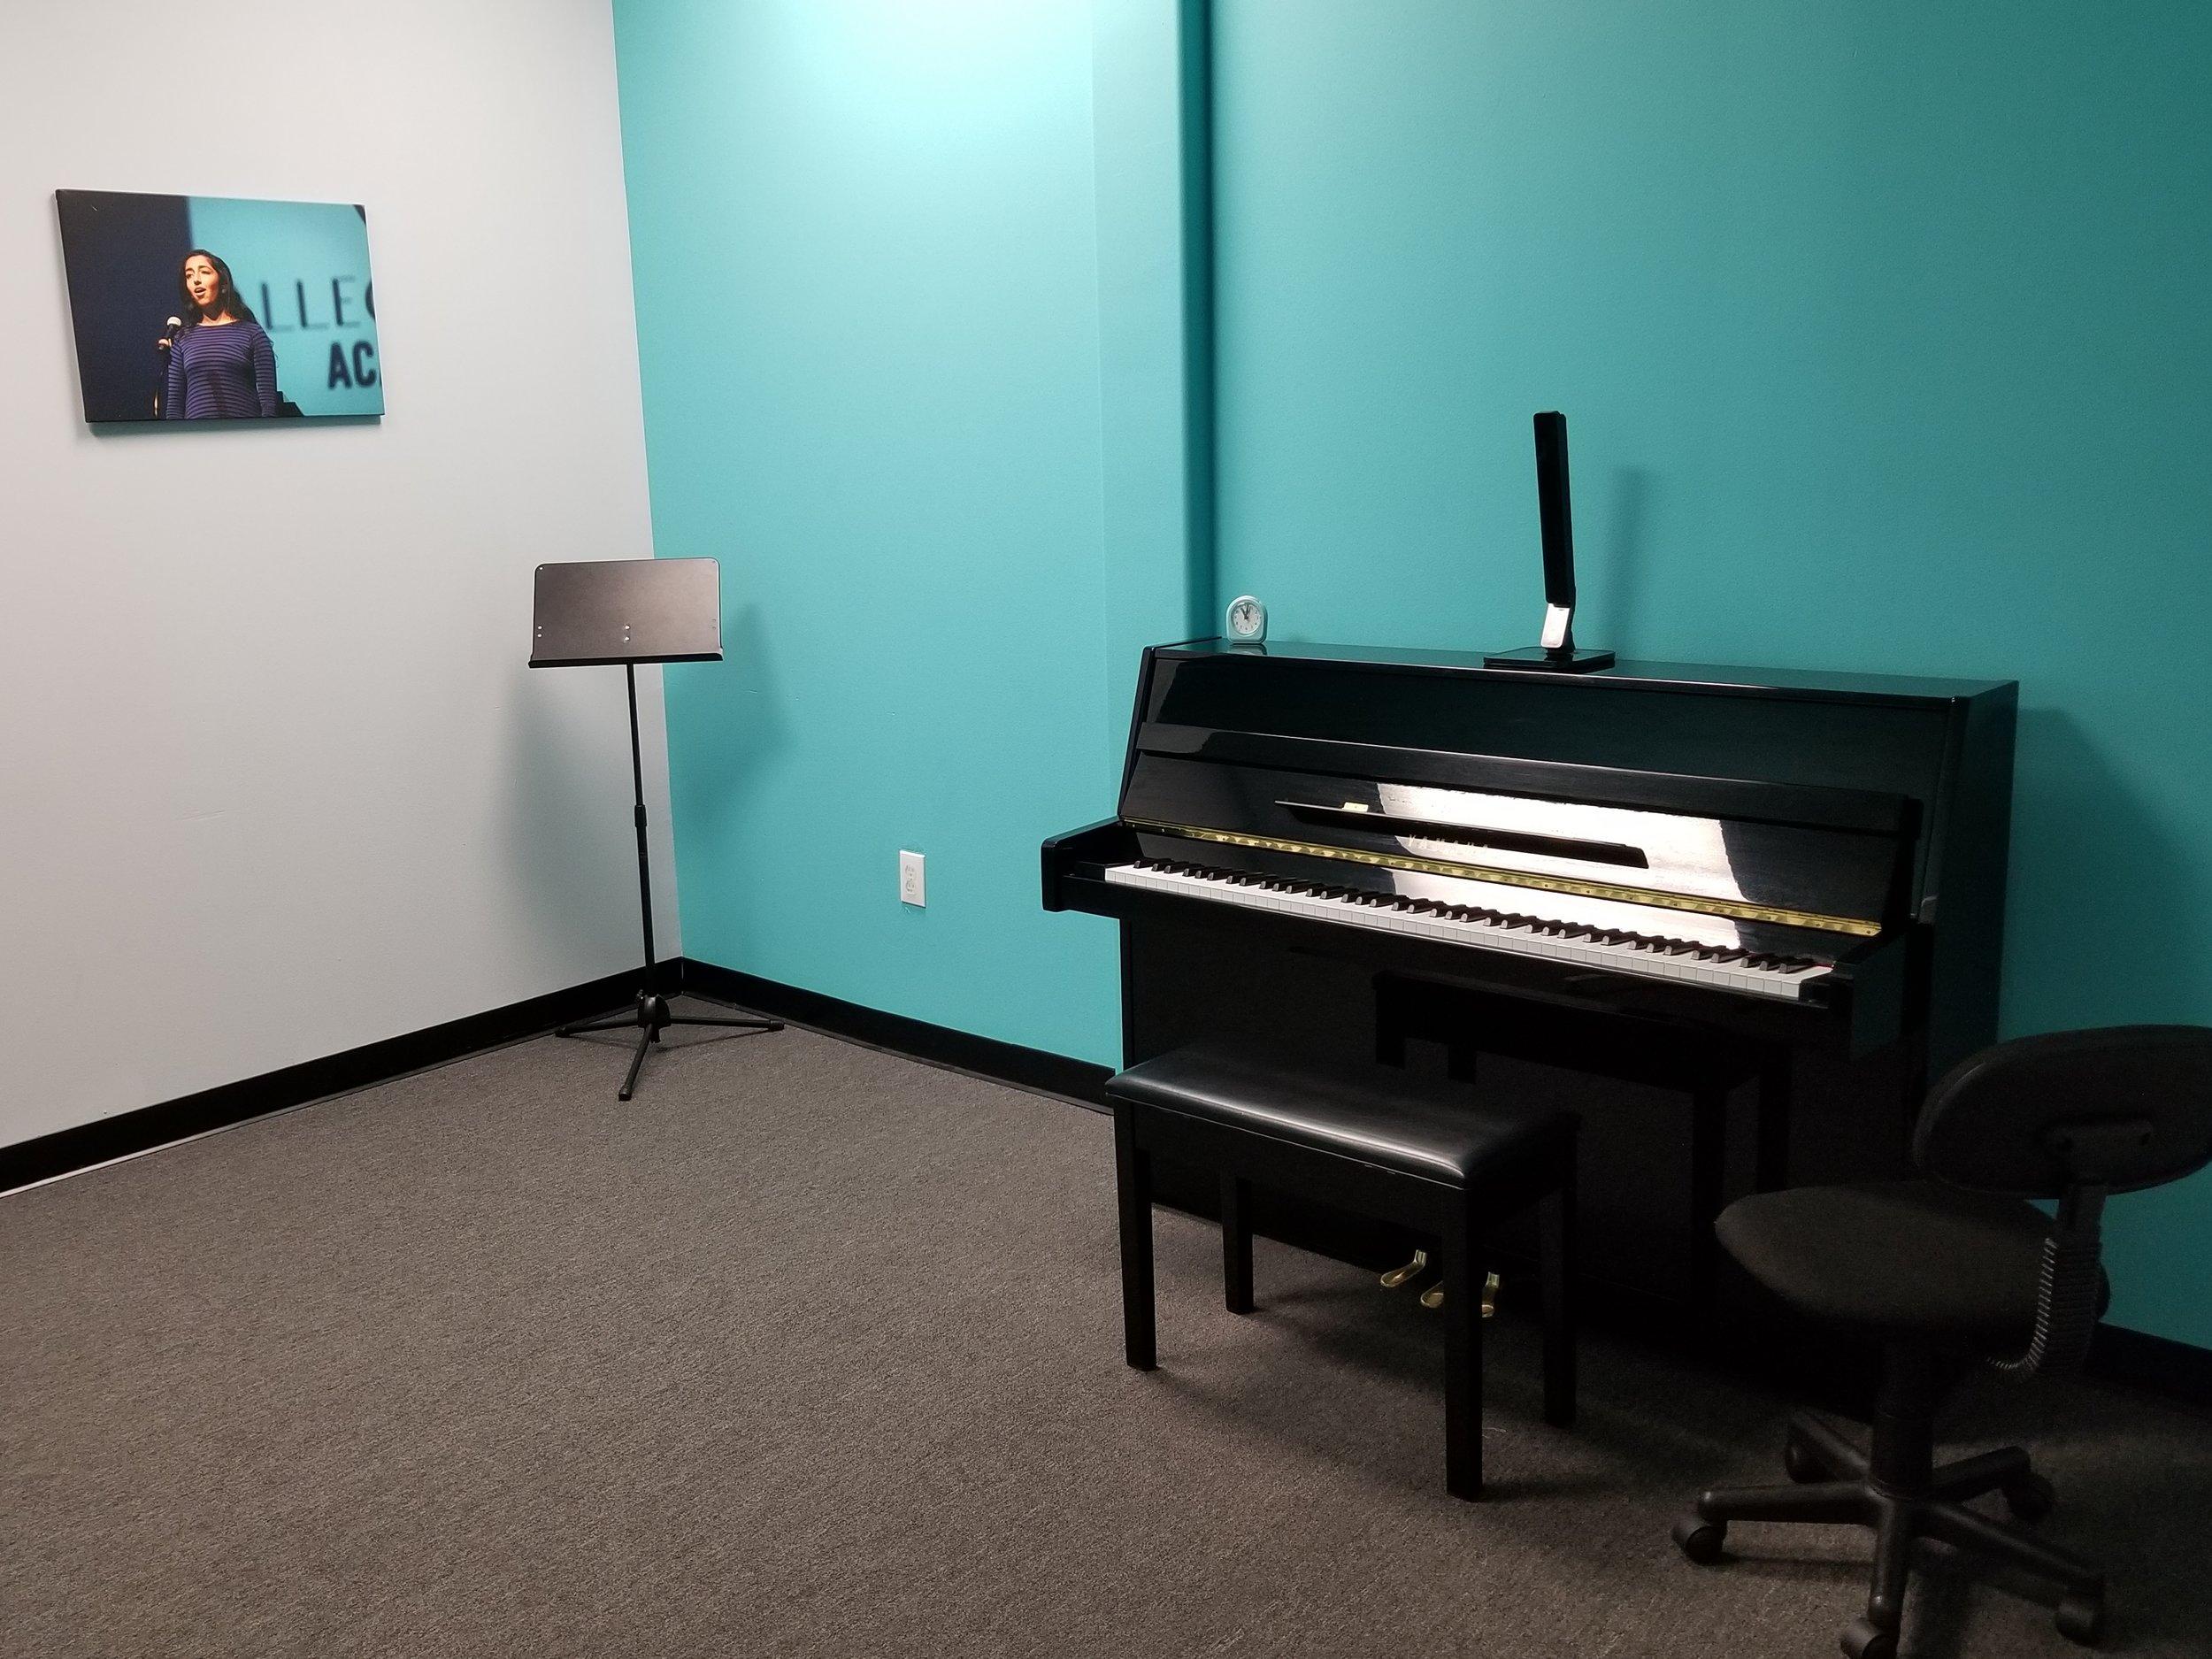 Studio 2 pic 2-2019.jpg